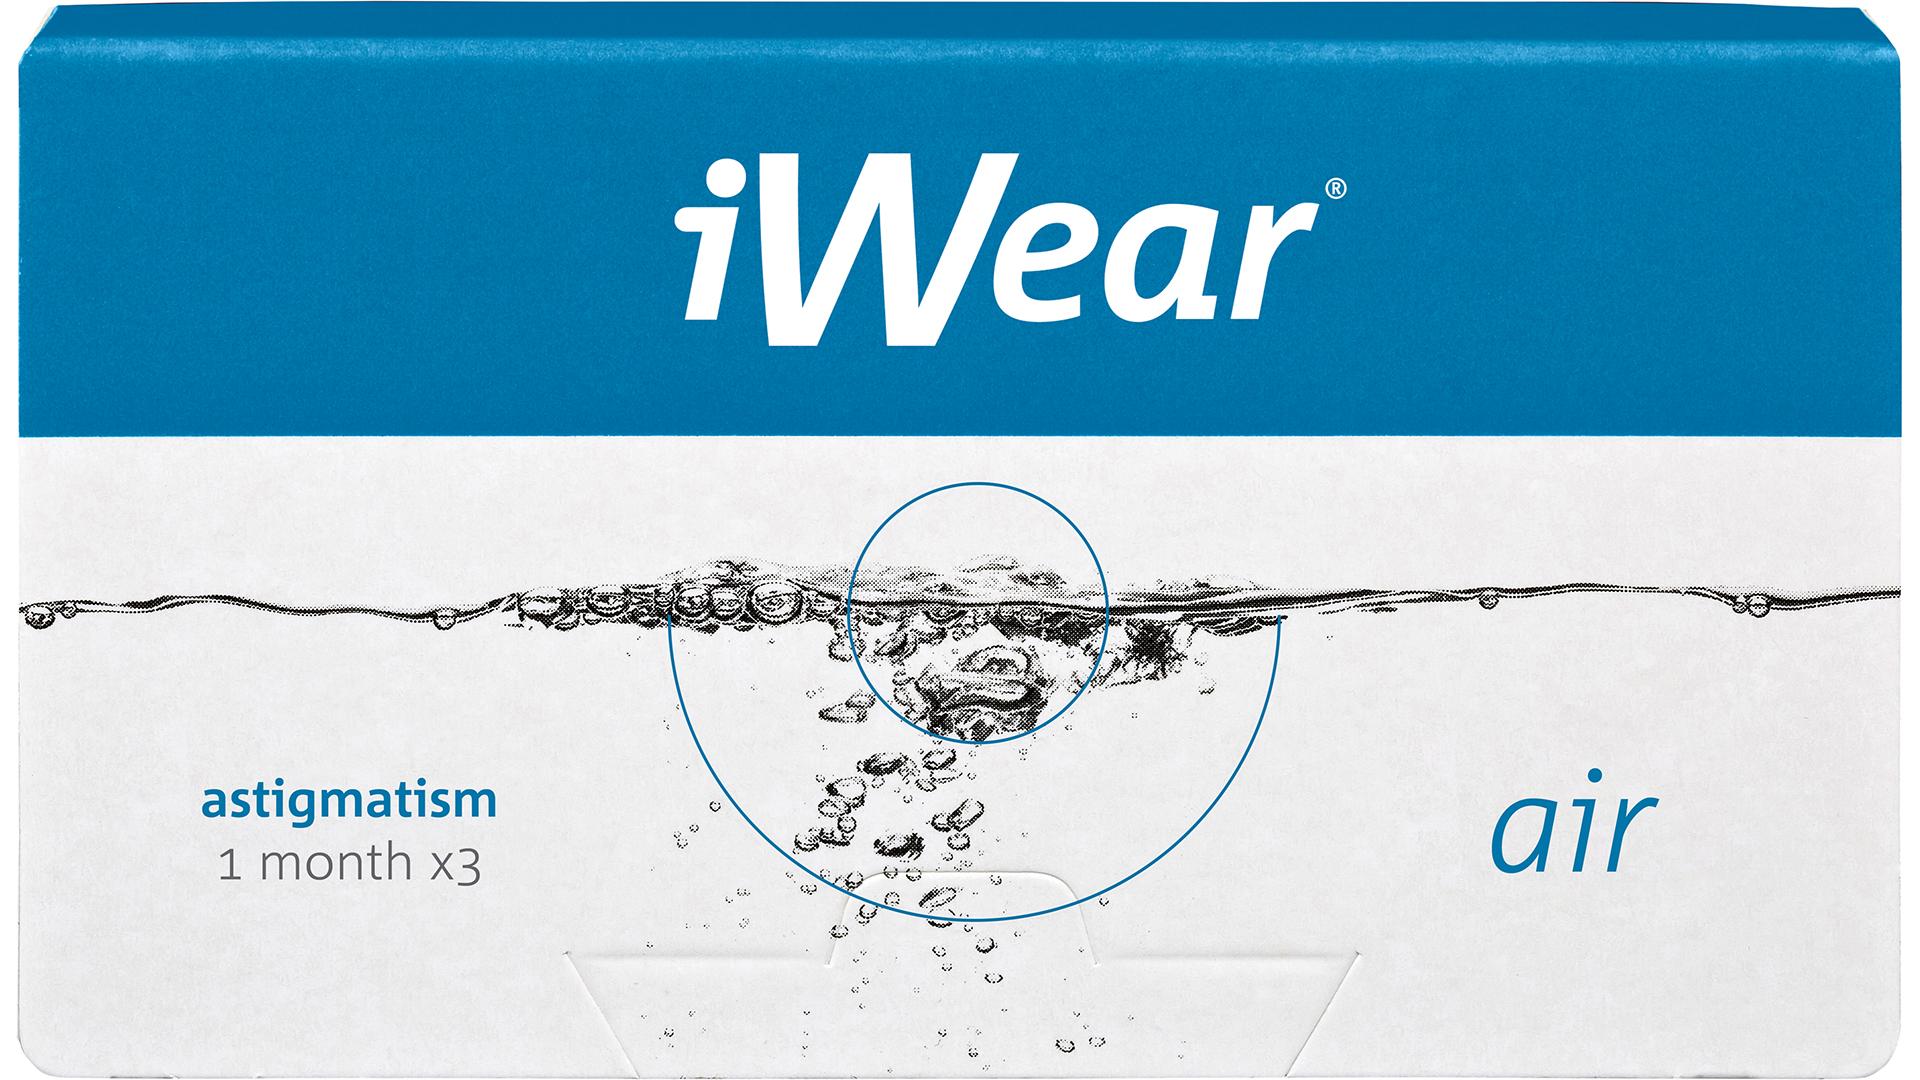 Front iWear air astigmatism